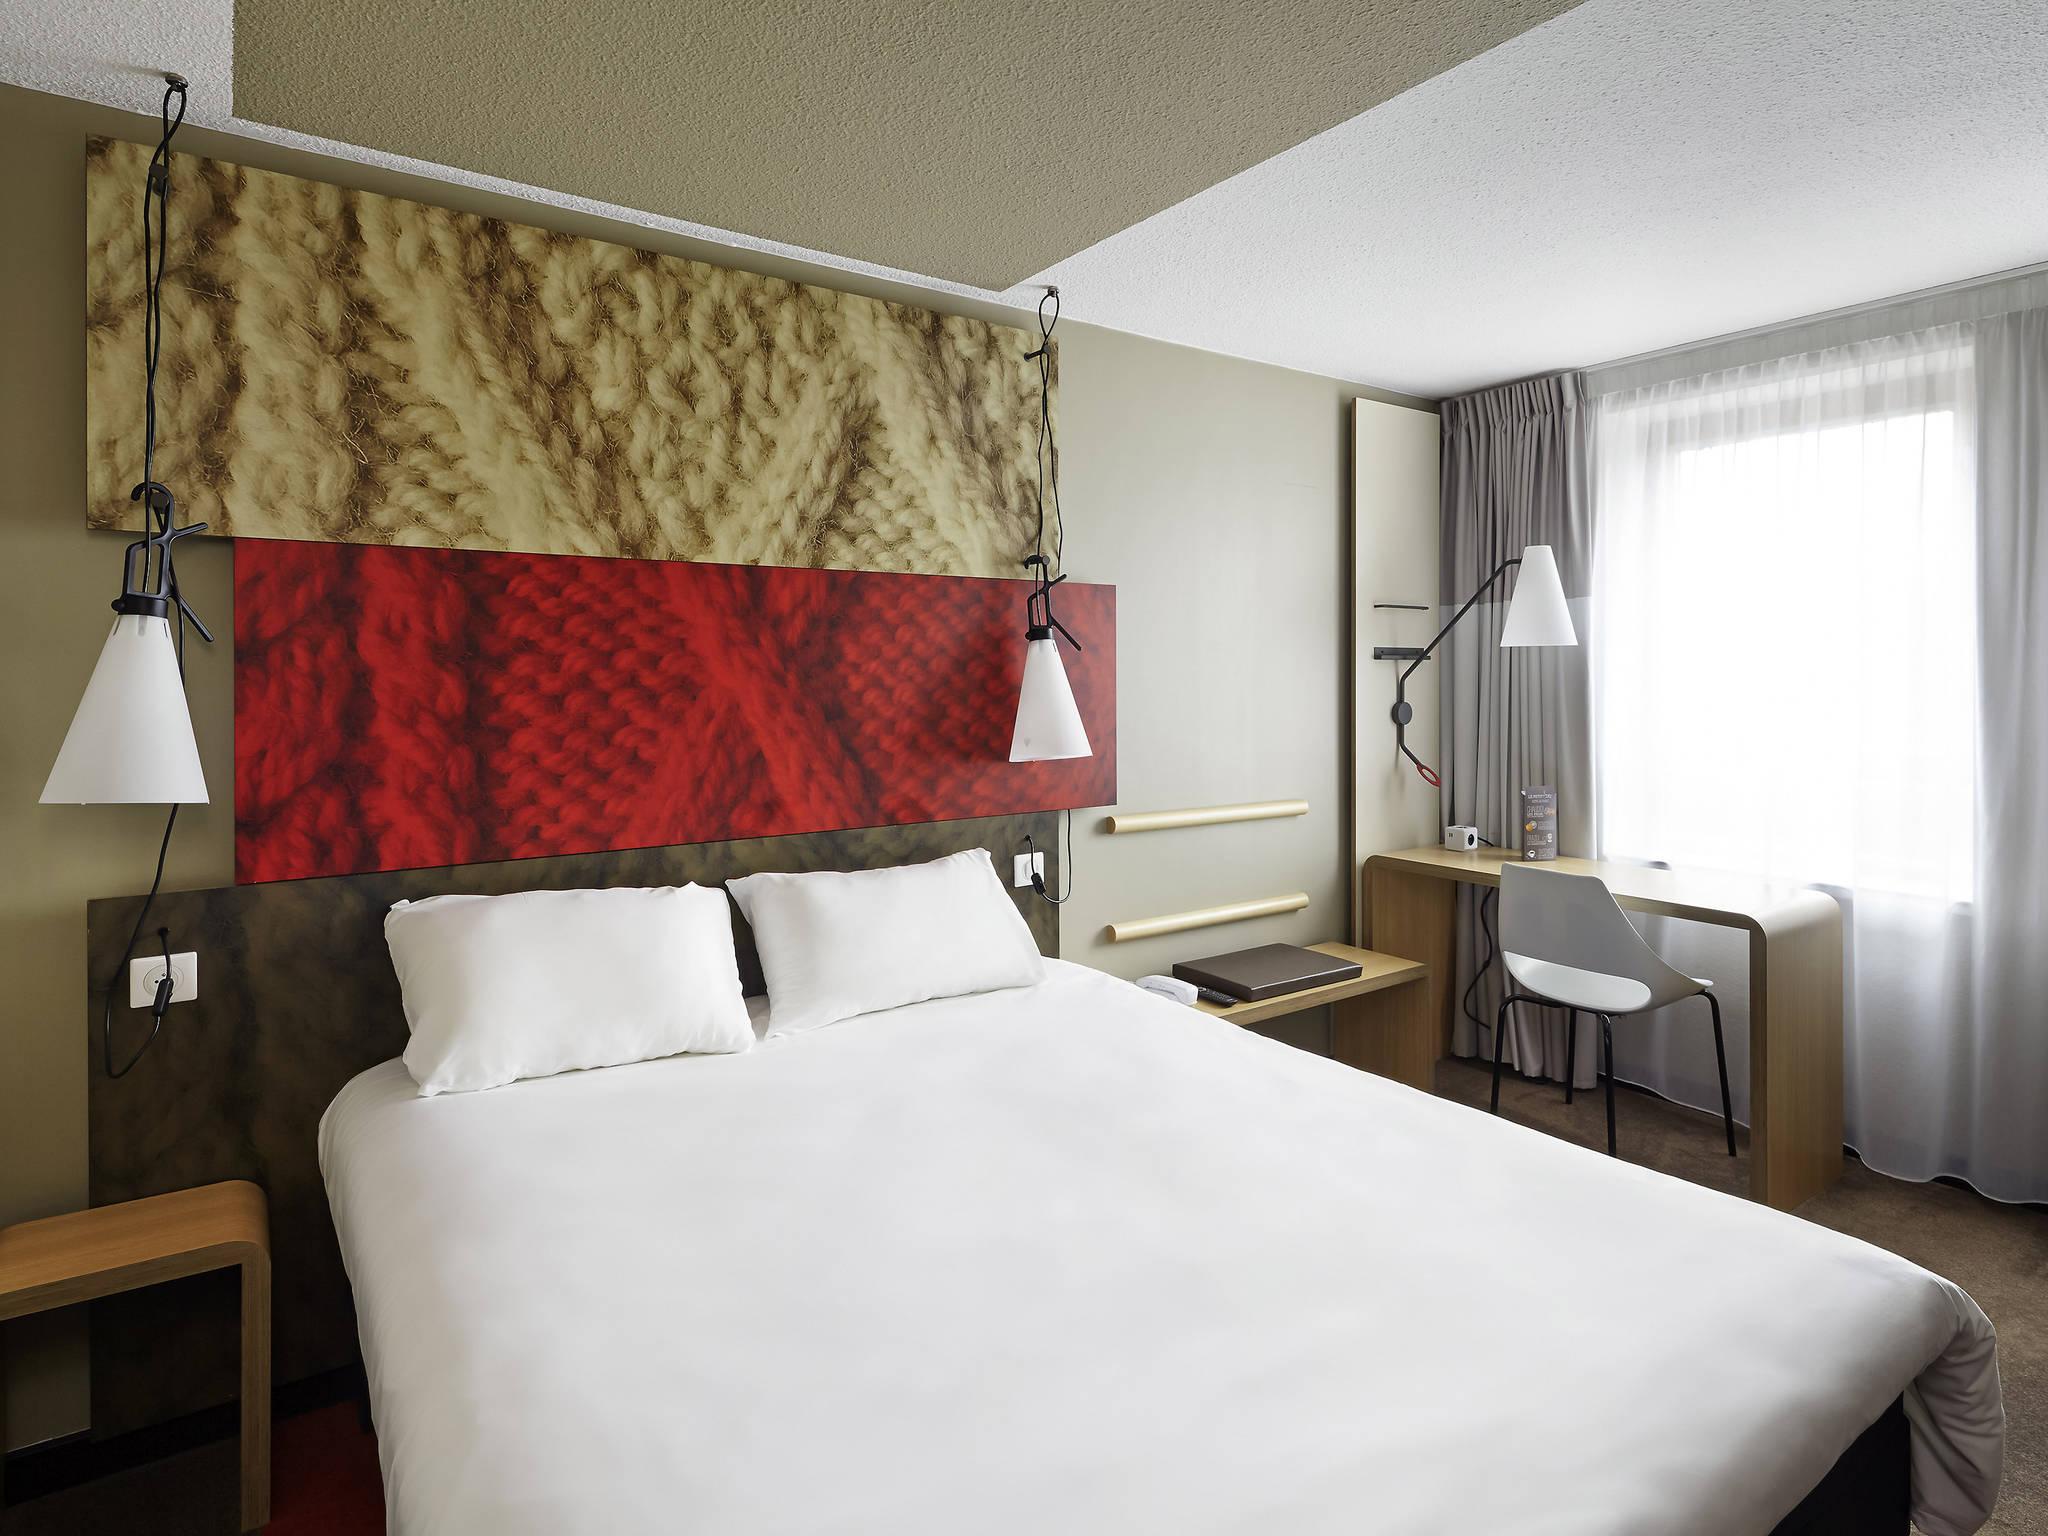 Camere Disneyland Paris : Hotel villa brunel hotels paris